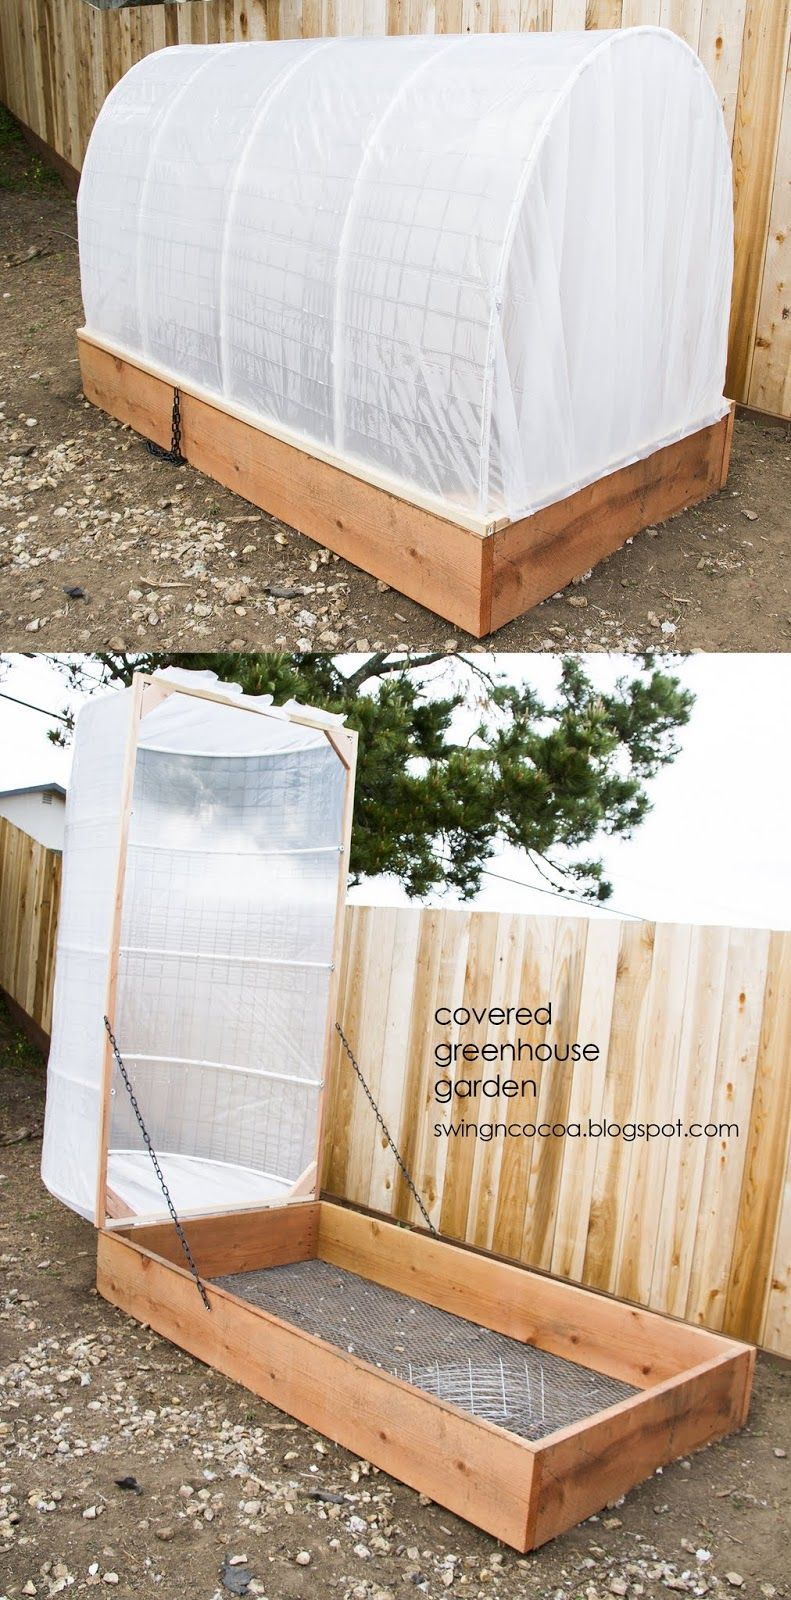 Swing open greenhouse garden pinterest greenhouse gardening